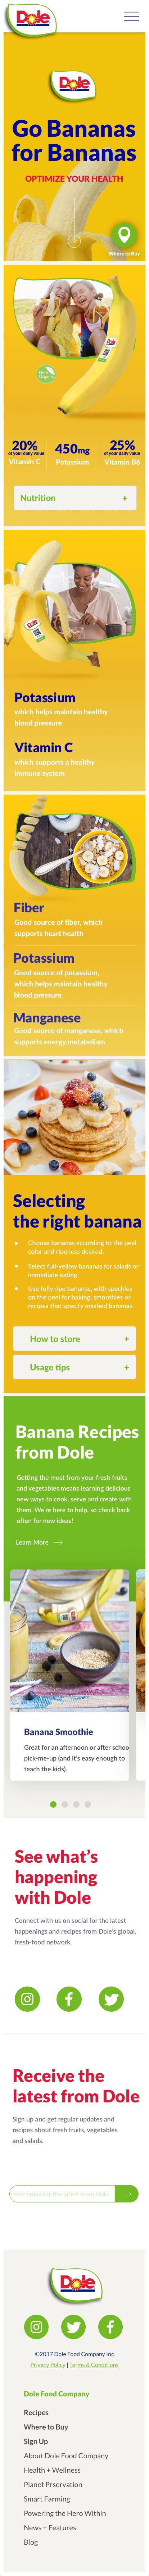 Dole_Bananas mobile.jpg